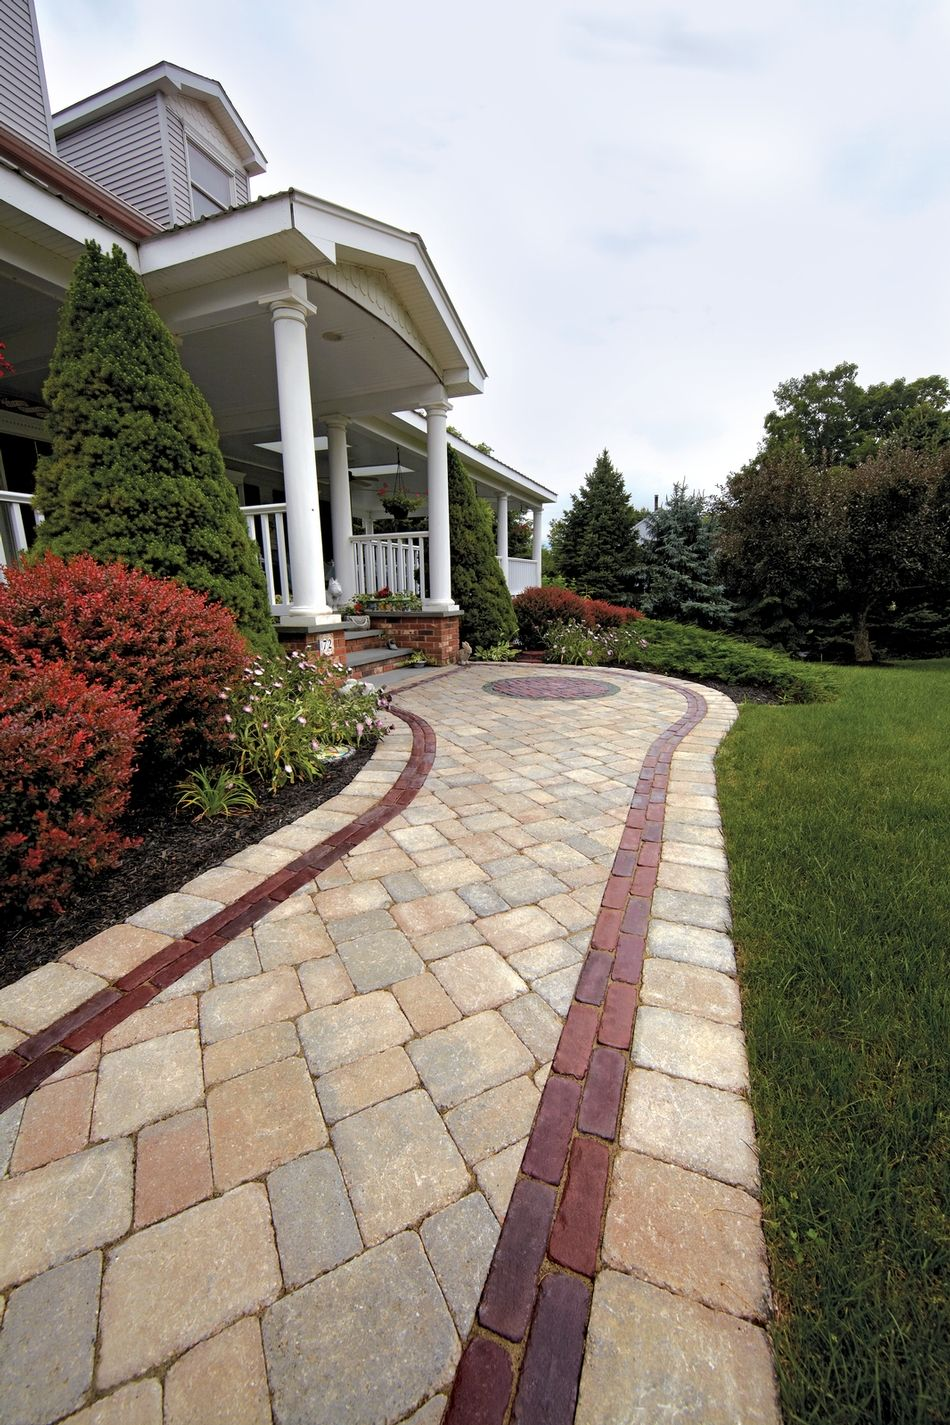 brussels block walkway with copthorne